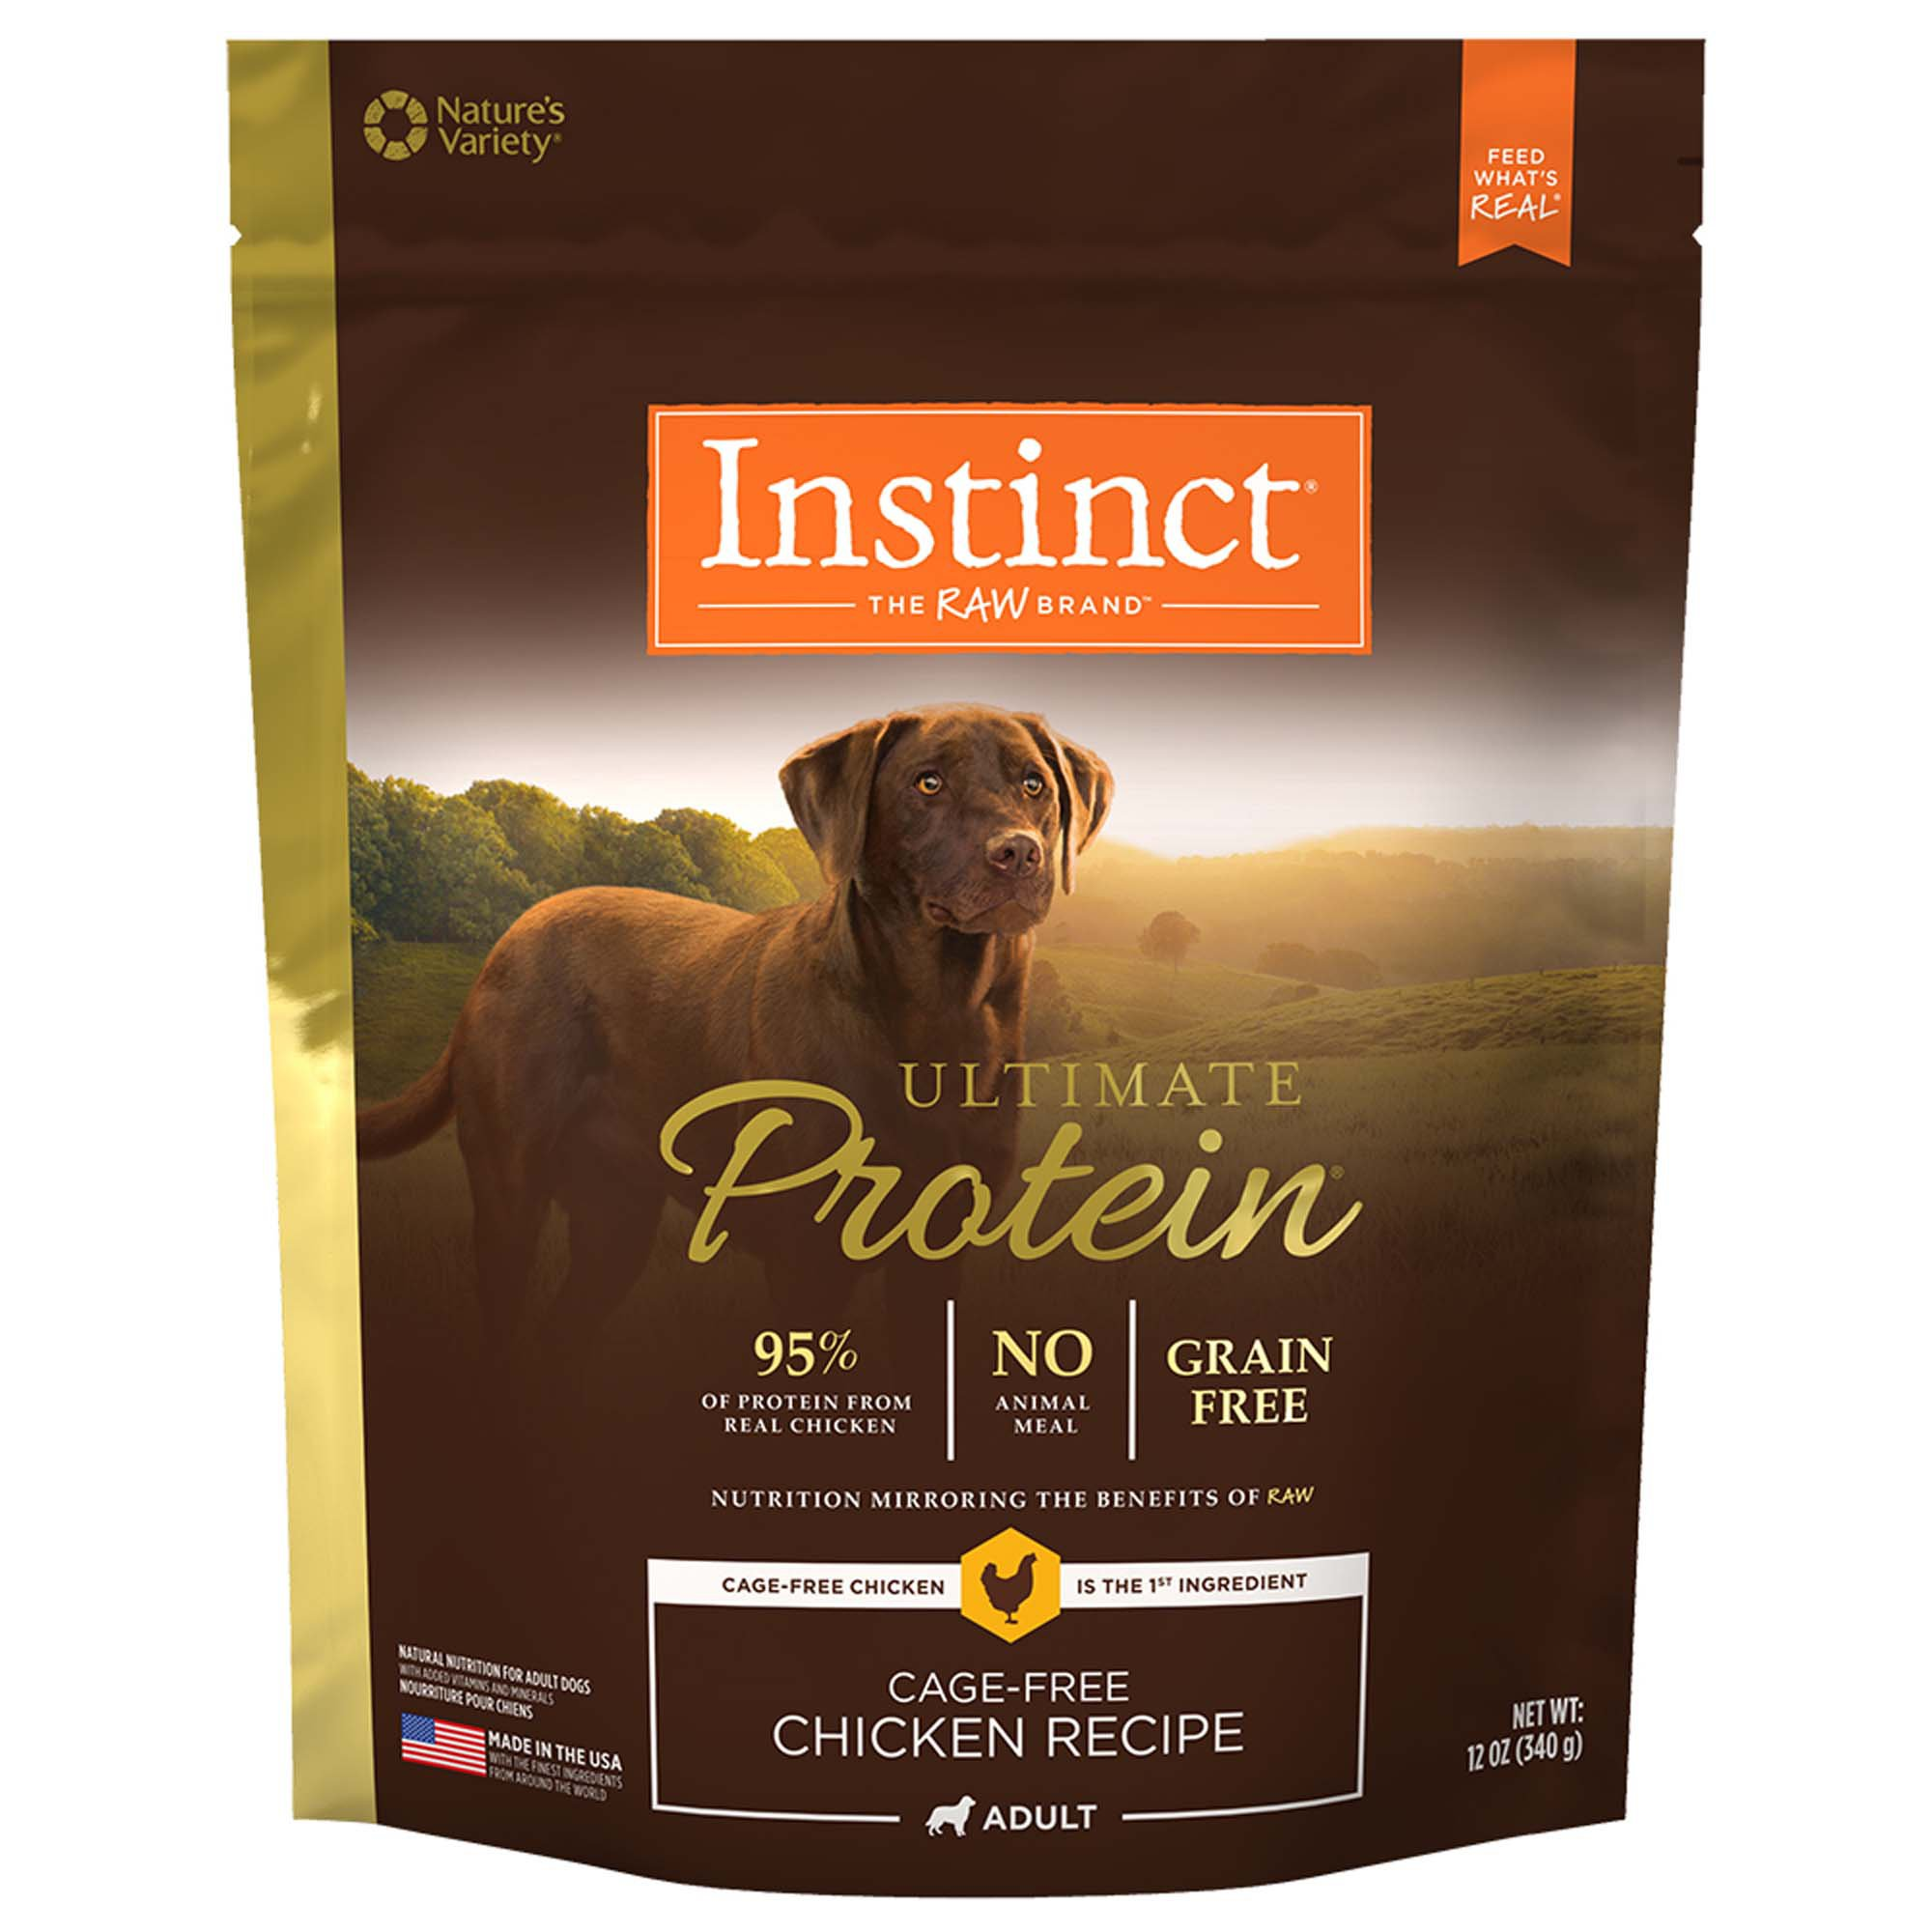 Nature's Variety Instinct Ultimate Protein Chicken Dog Food